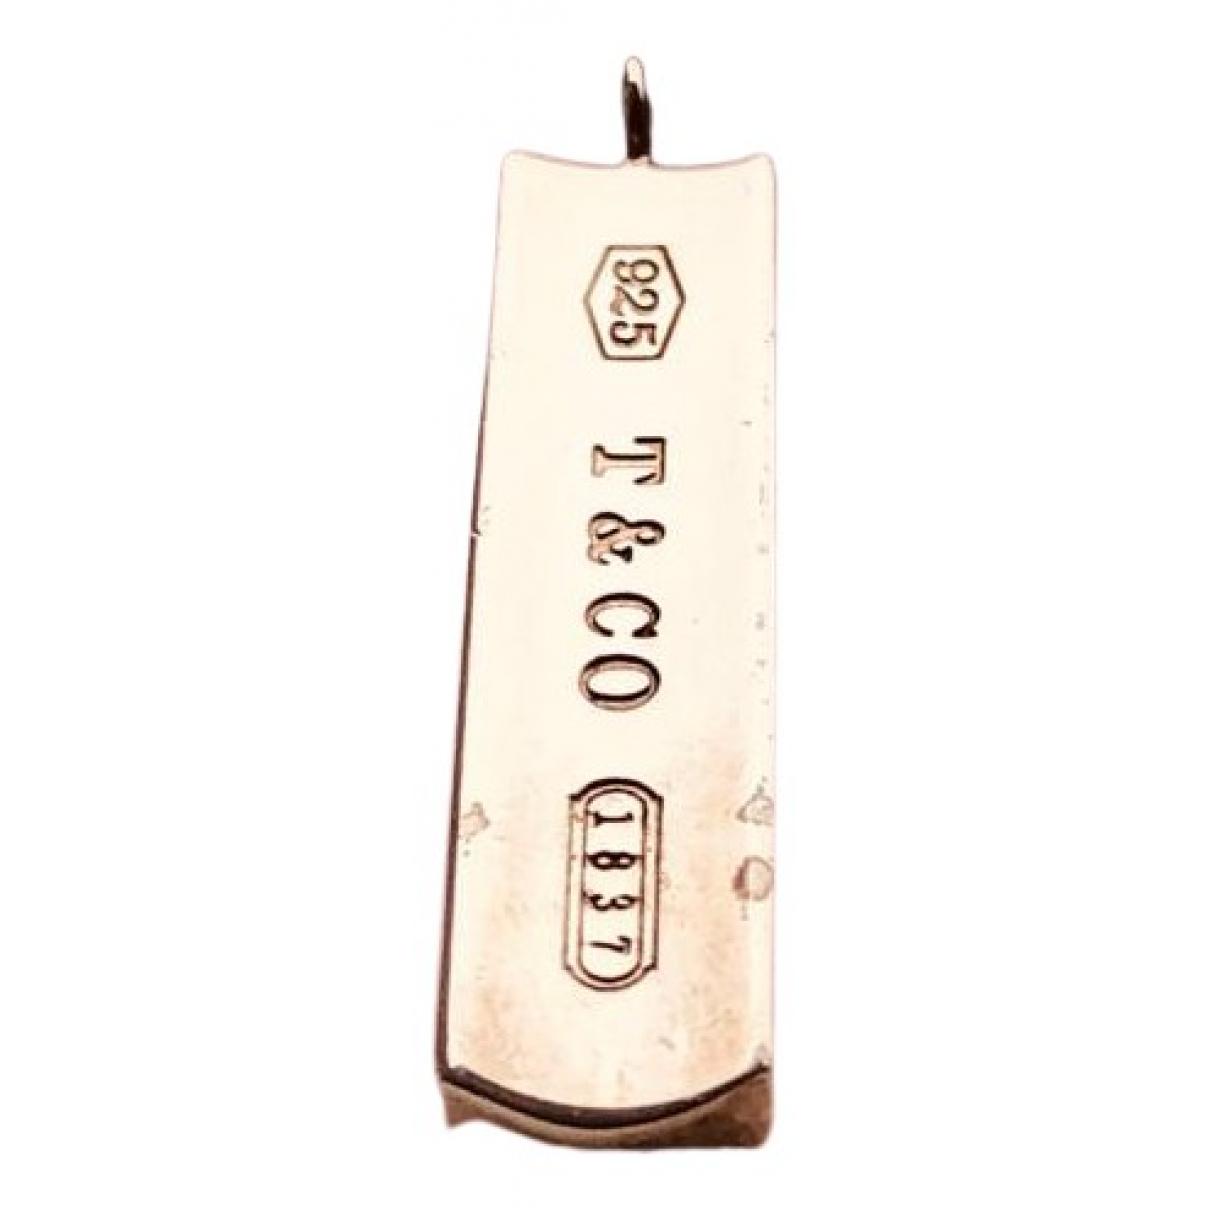 Tiffany & Co Tiffany 1837 Anhaenger in  Metallic Silber